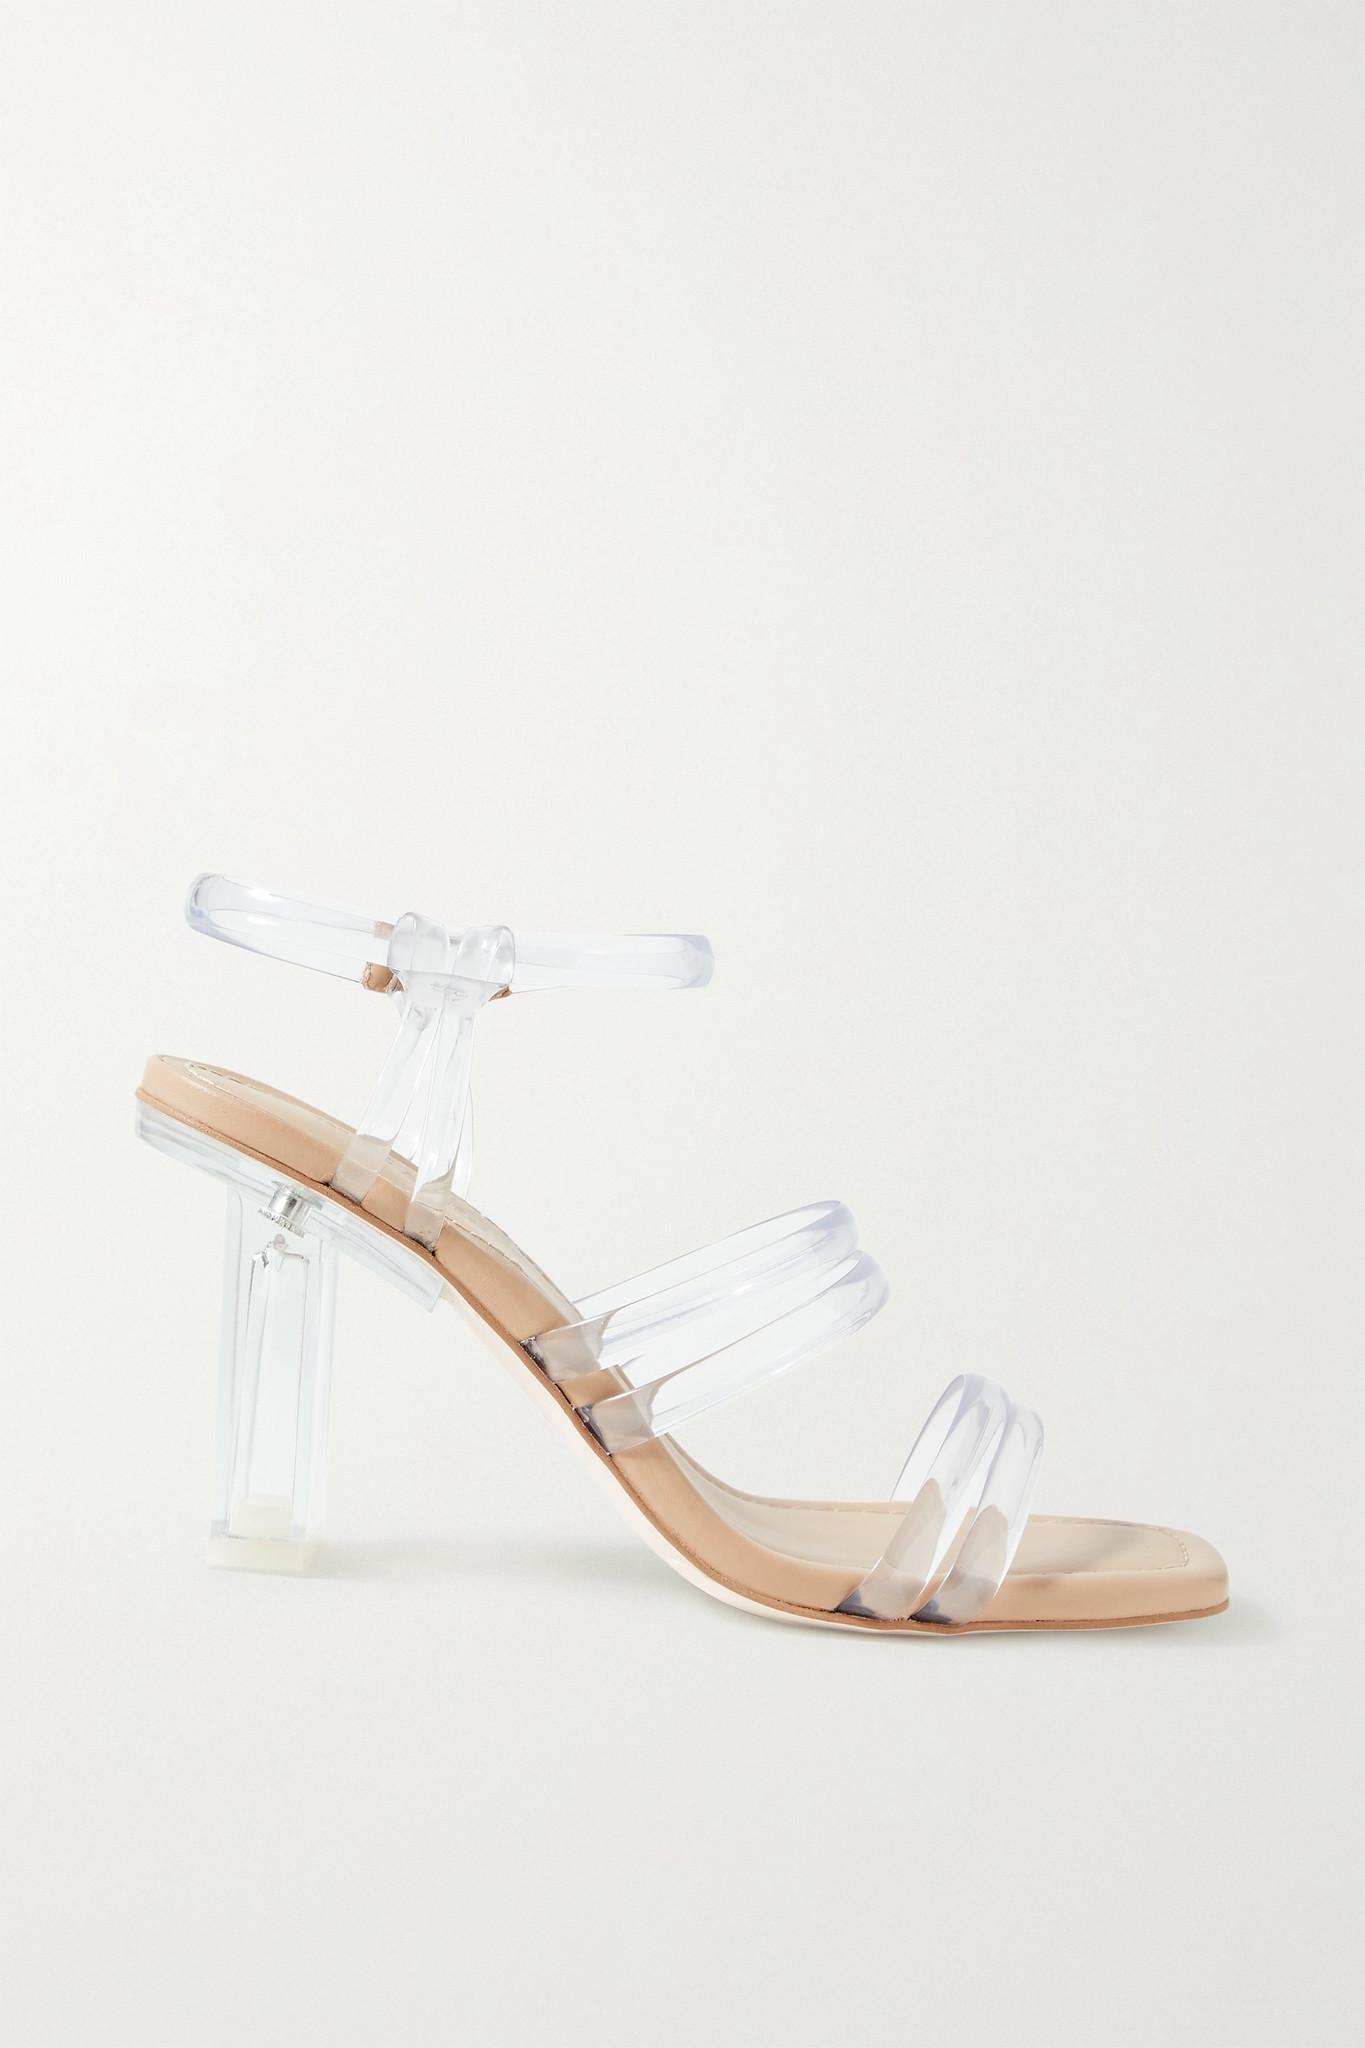 CULT GAIA - Kayla Pvc Sandals - Neutrals - IT36.5